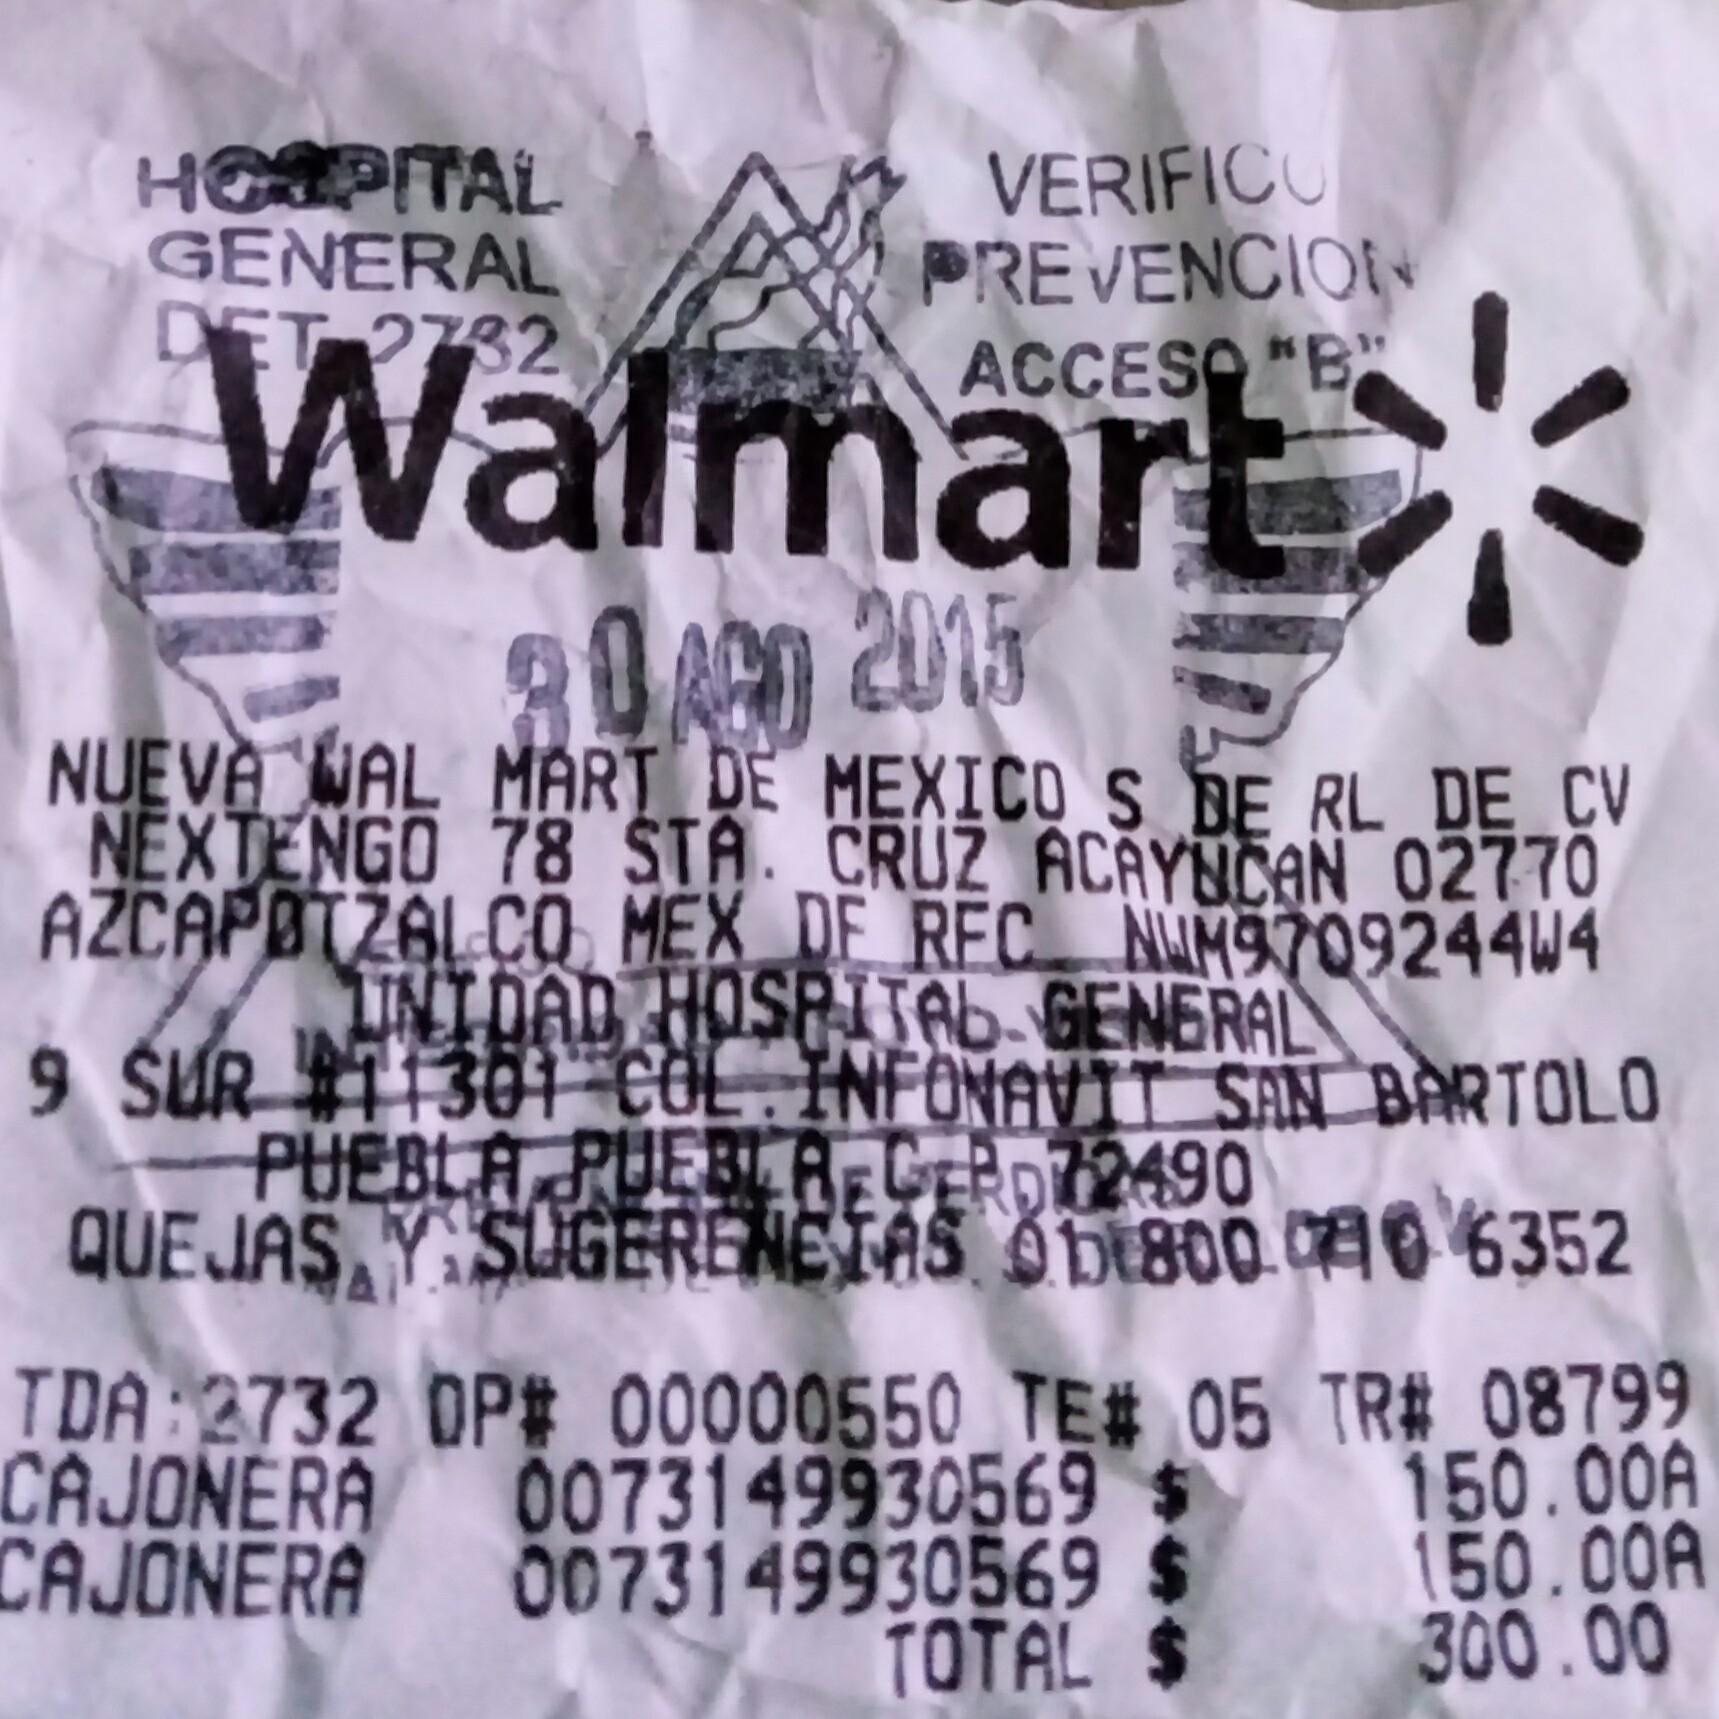 Walmart: Cajonera Sterilite, 3 niveles (color verde) a $150